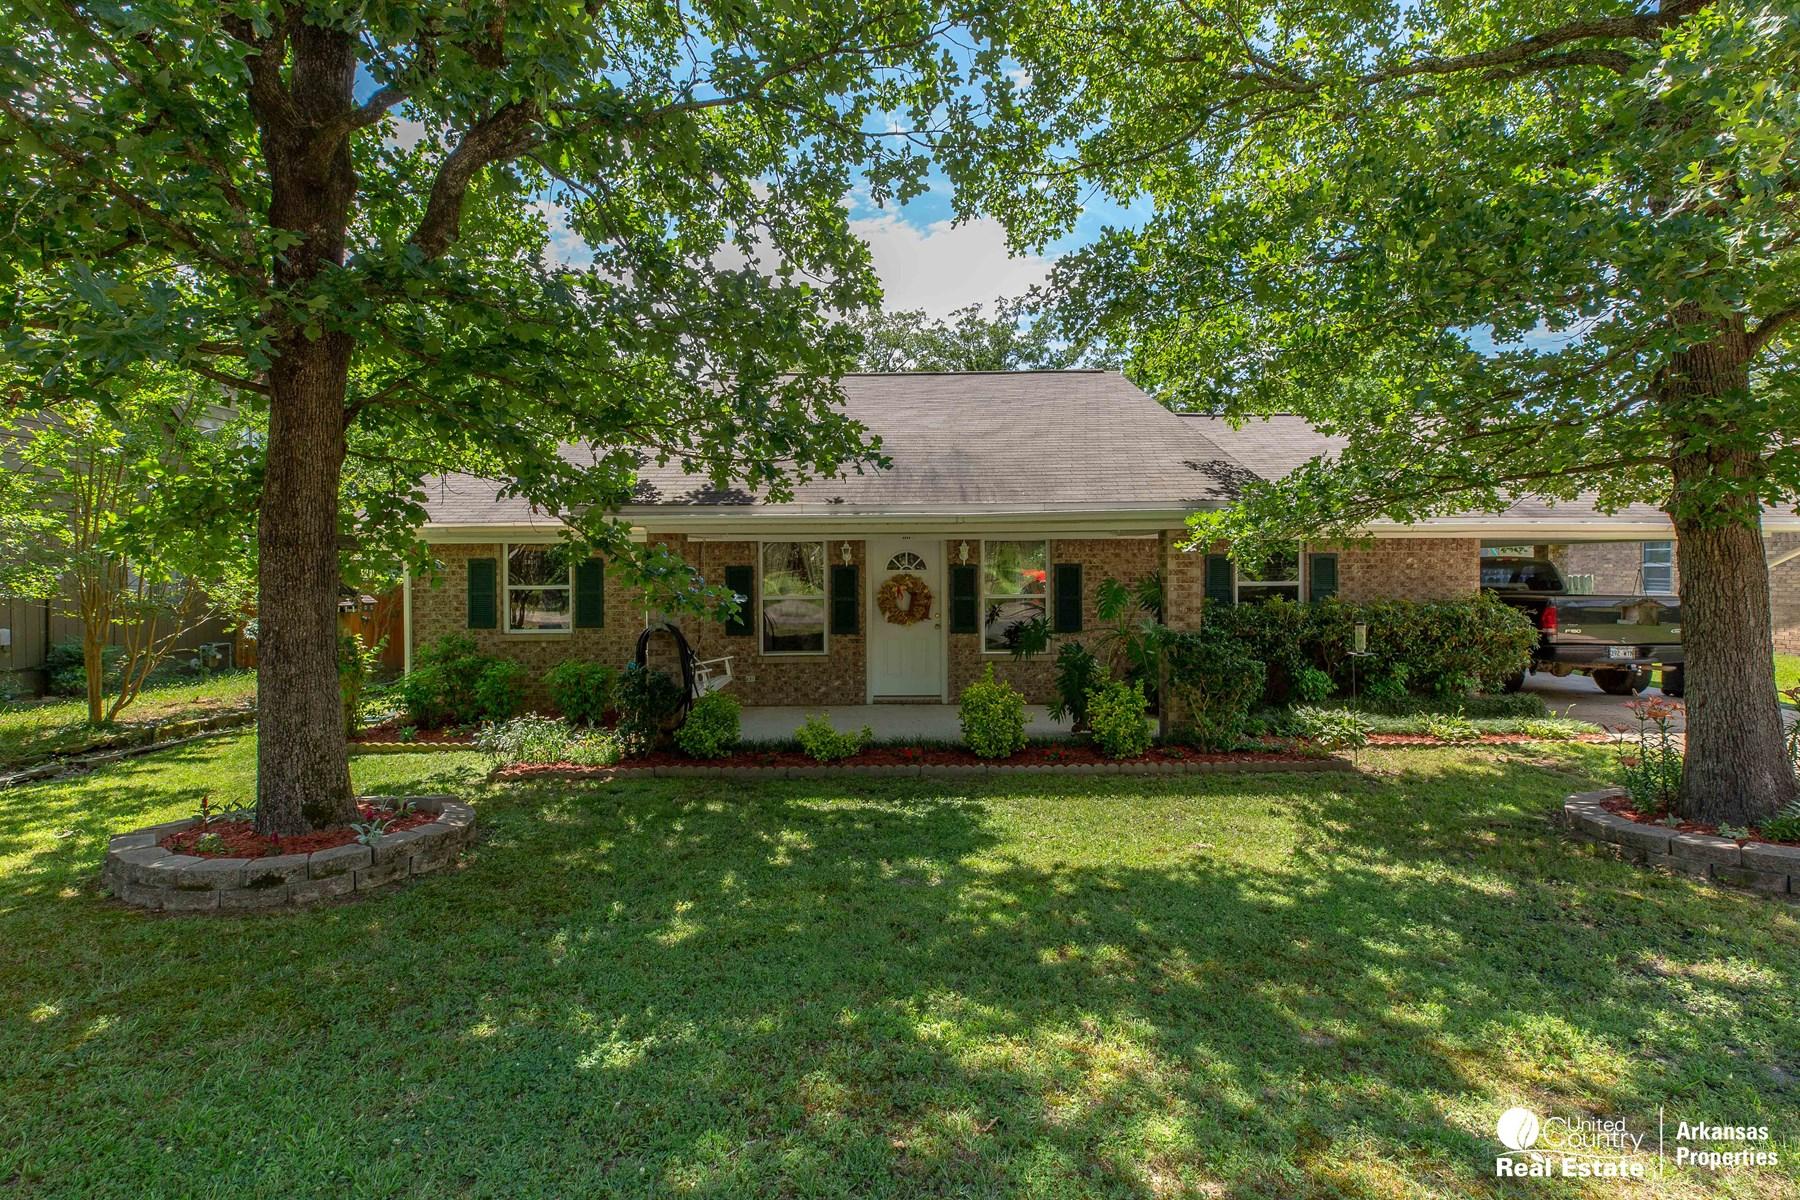 Mena ArkansasRecently Sold – United County Arkansas Properties